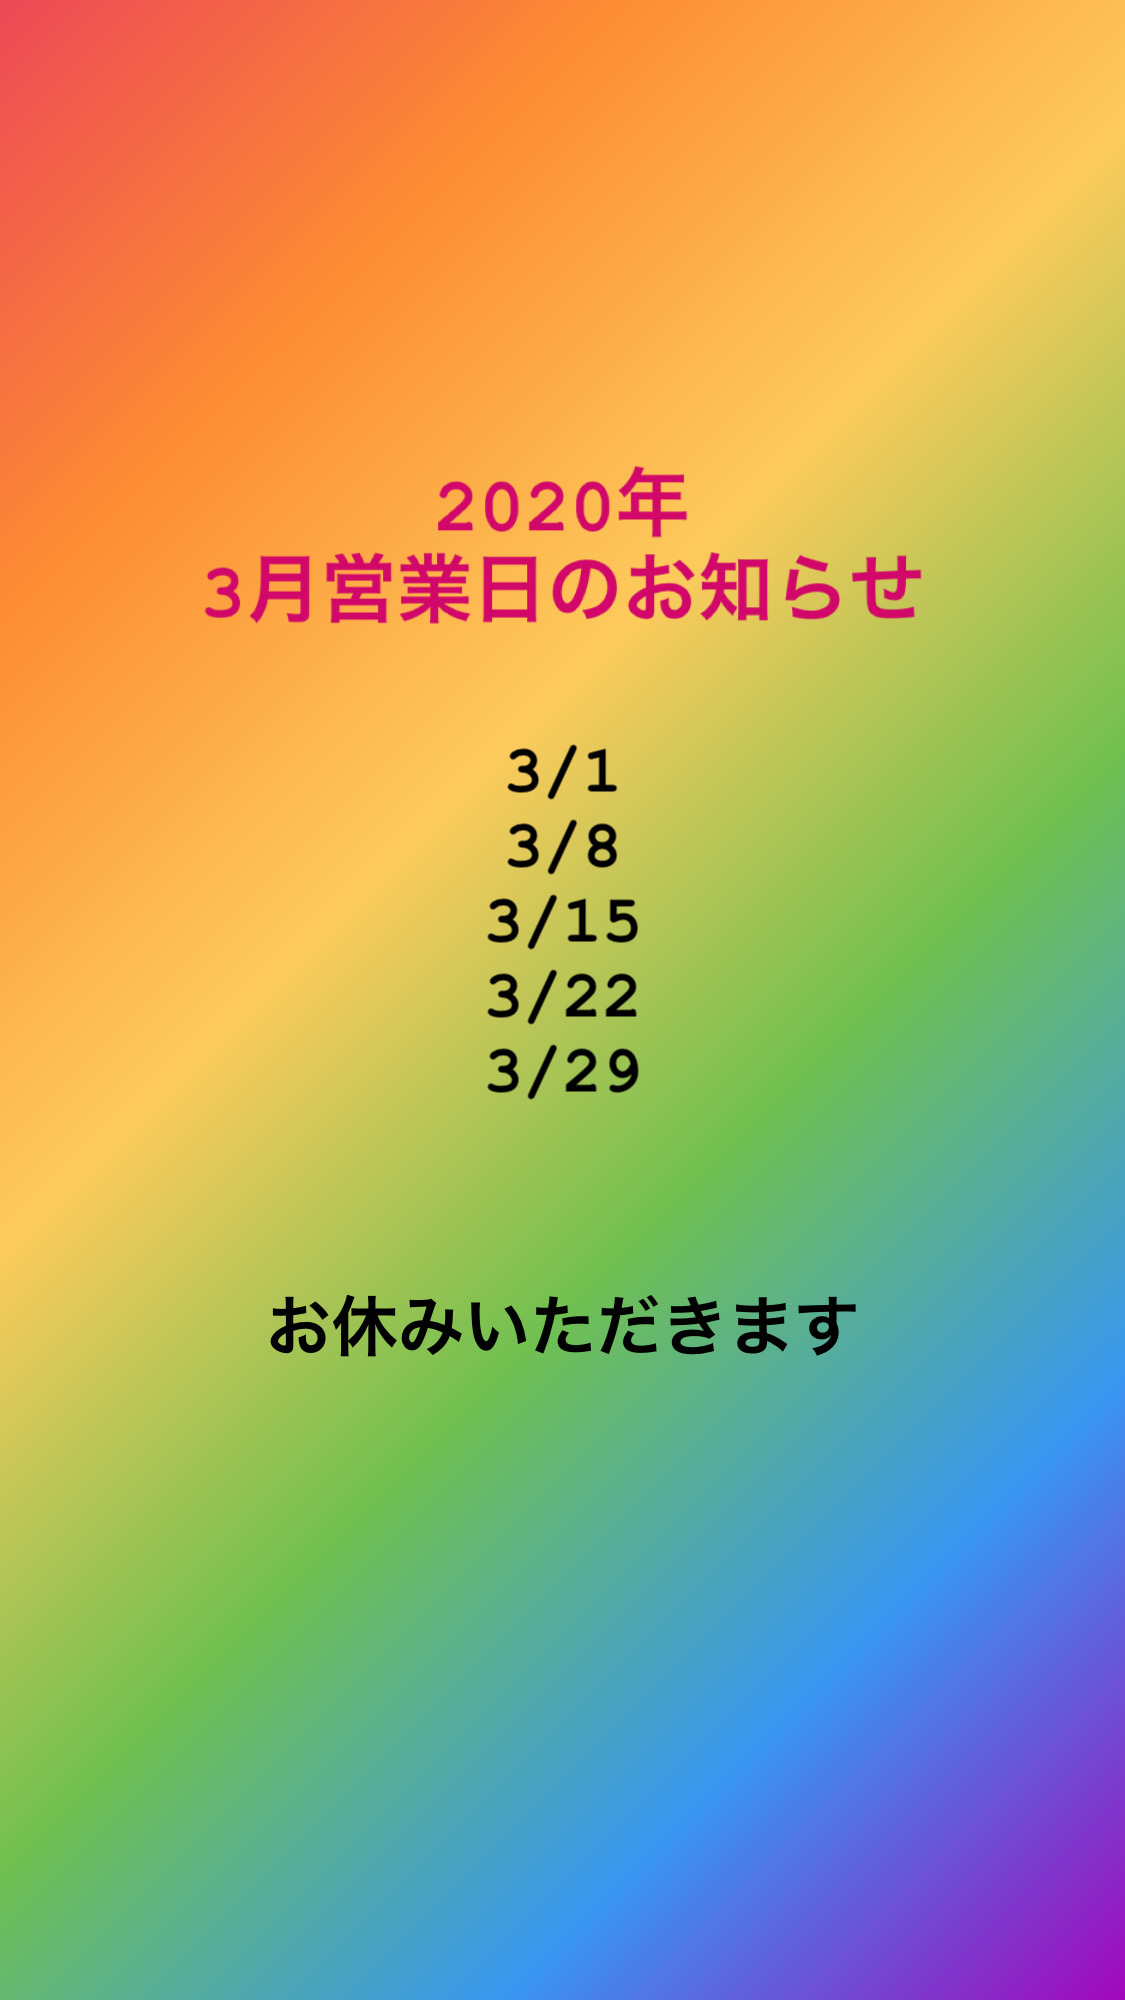 97AB9E2C-8B4E-41CC-8754-2246F0C3CD45